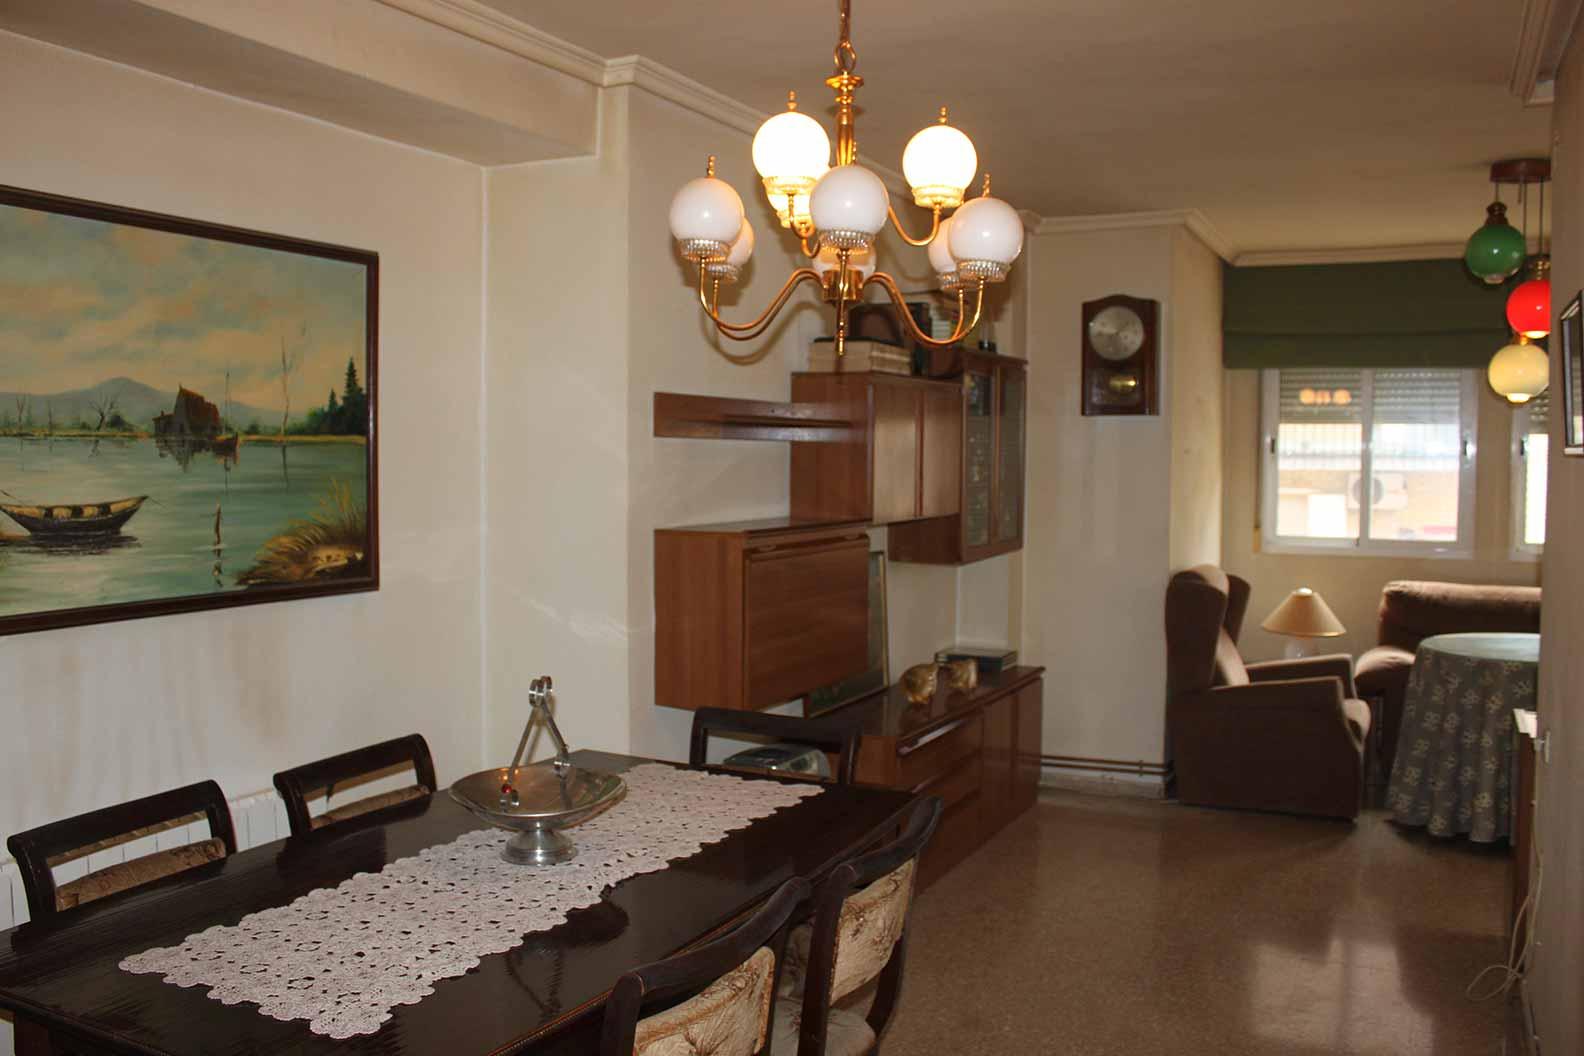 Bonito piso semireformado con Balcón